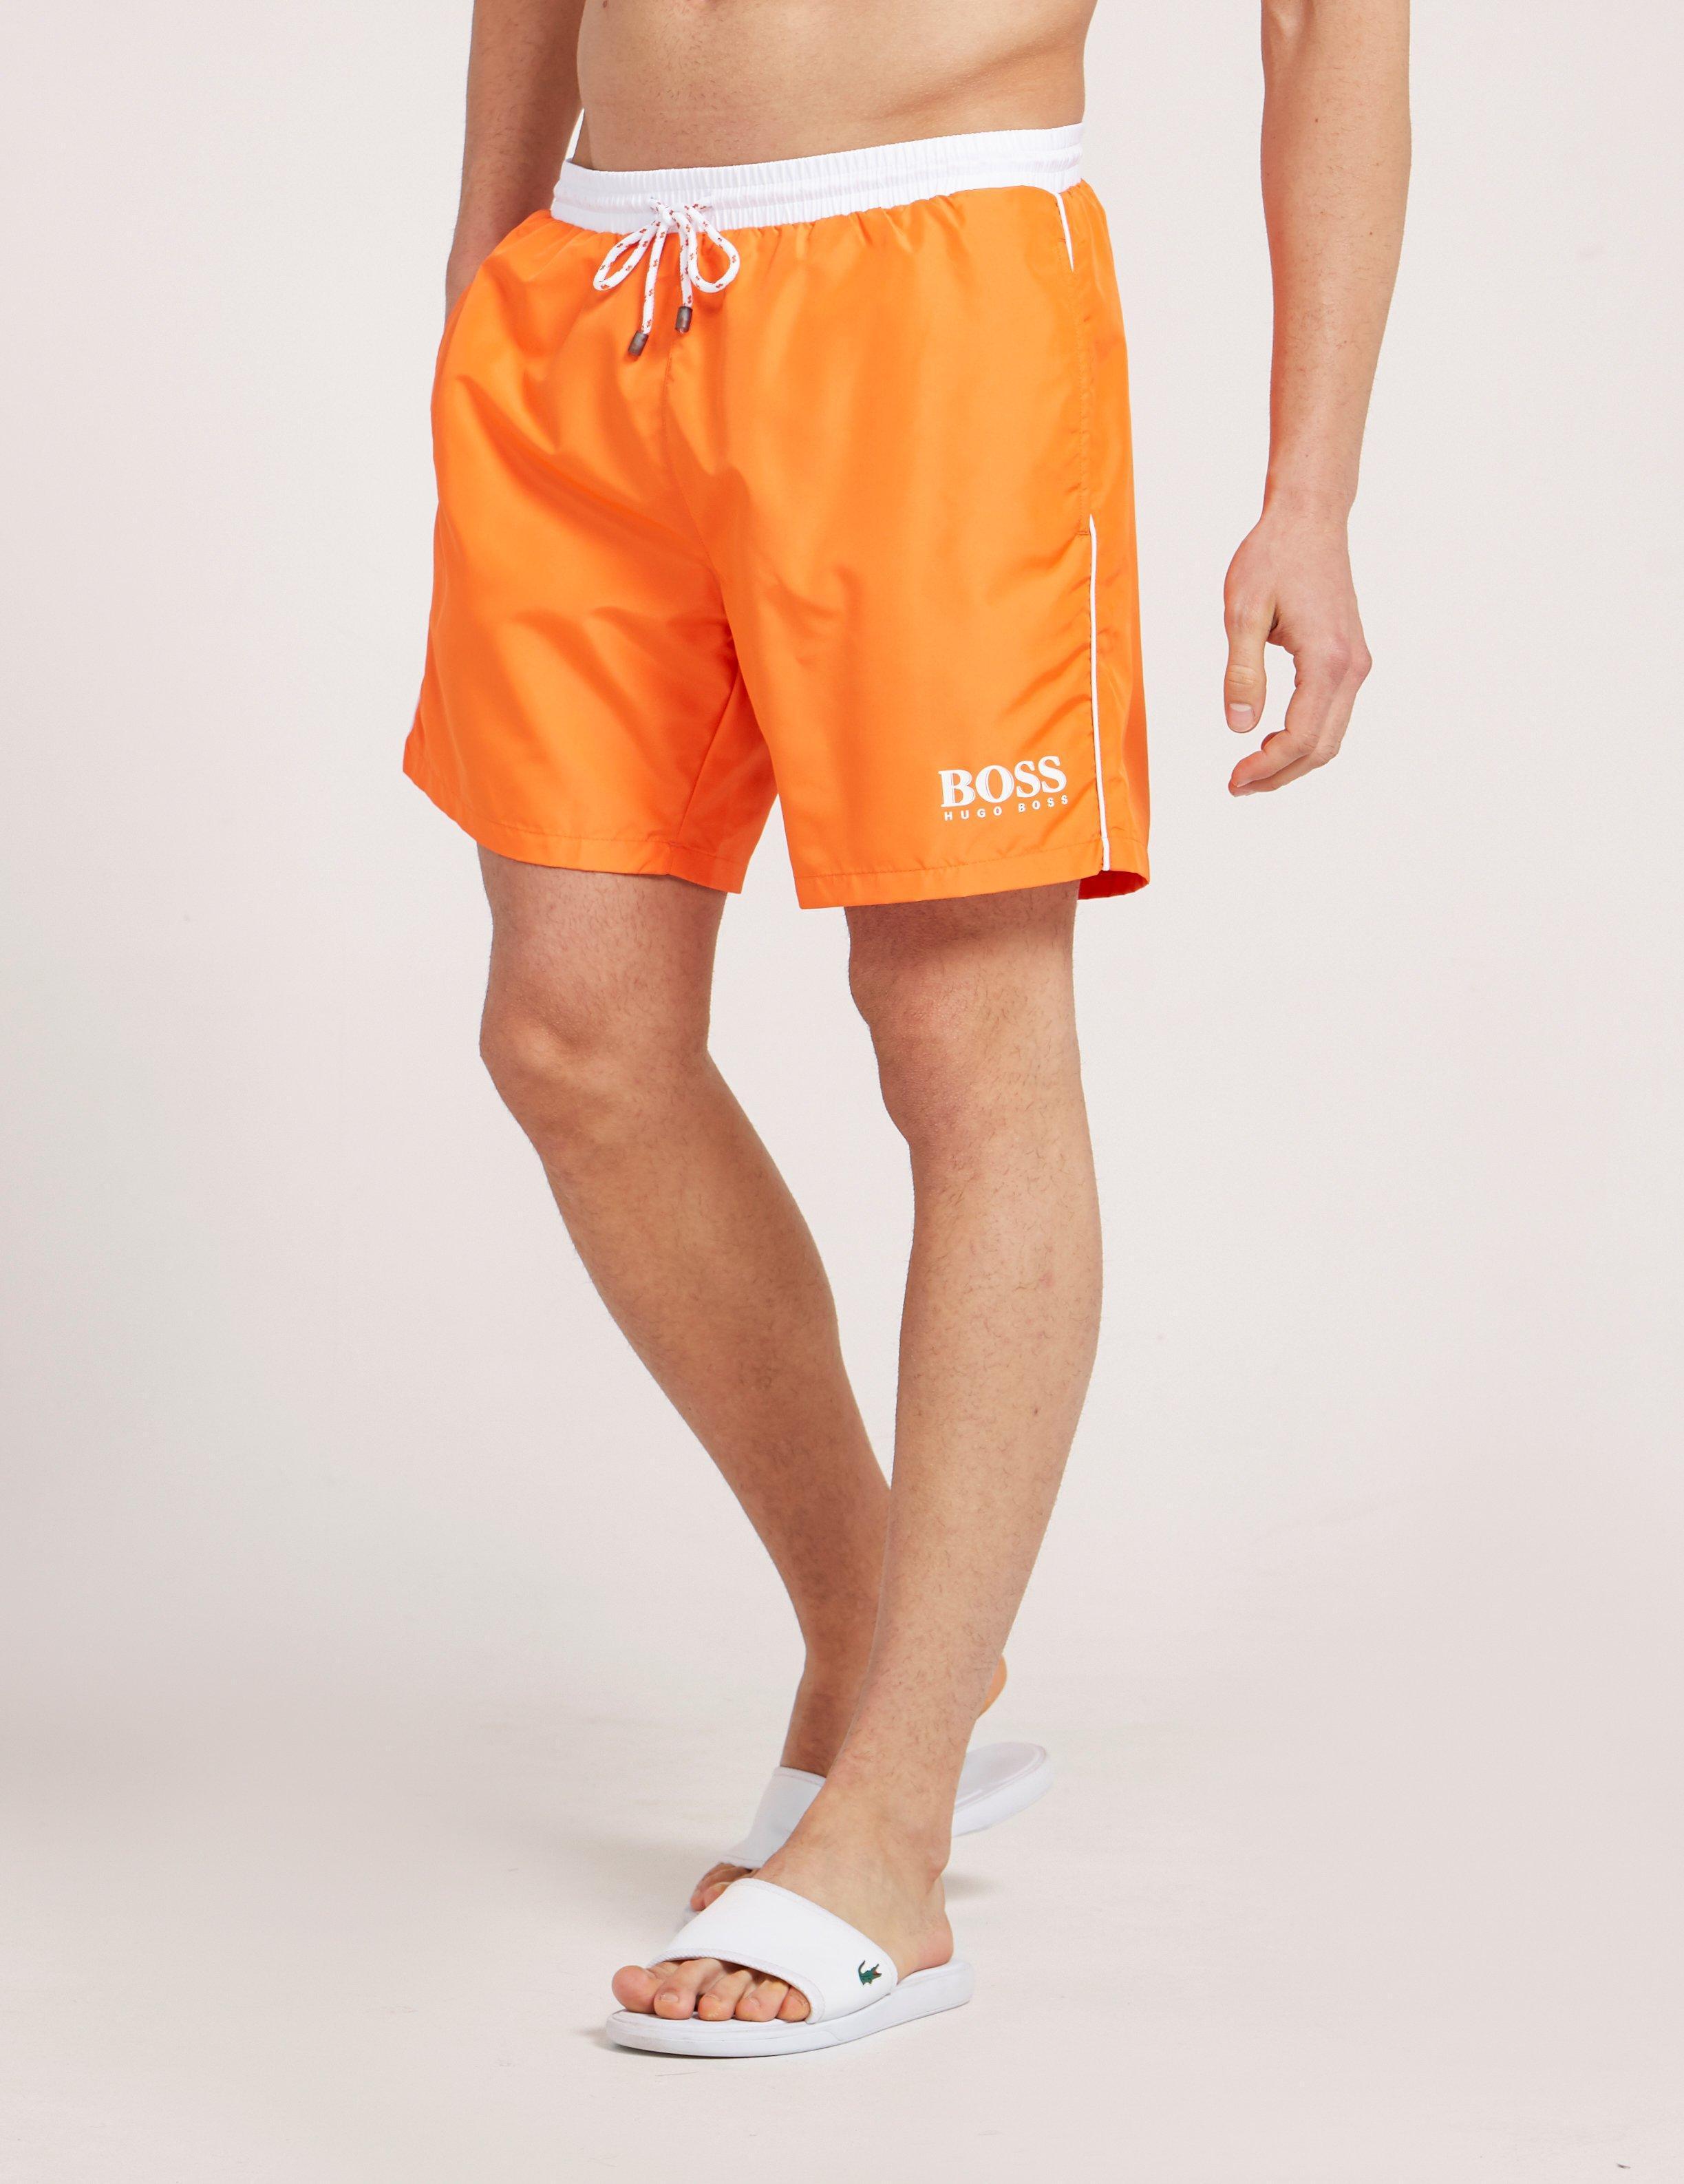 85aa84faa BOSS Mens Starfish Swim Shorts Orange in Orange for Men - Lyst